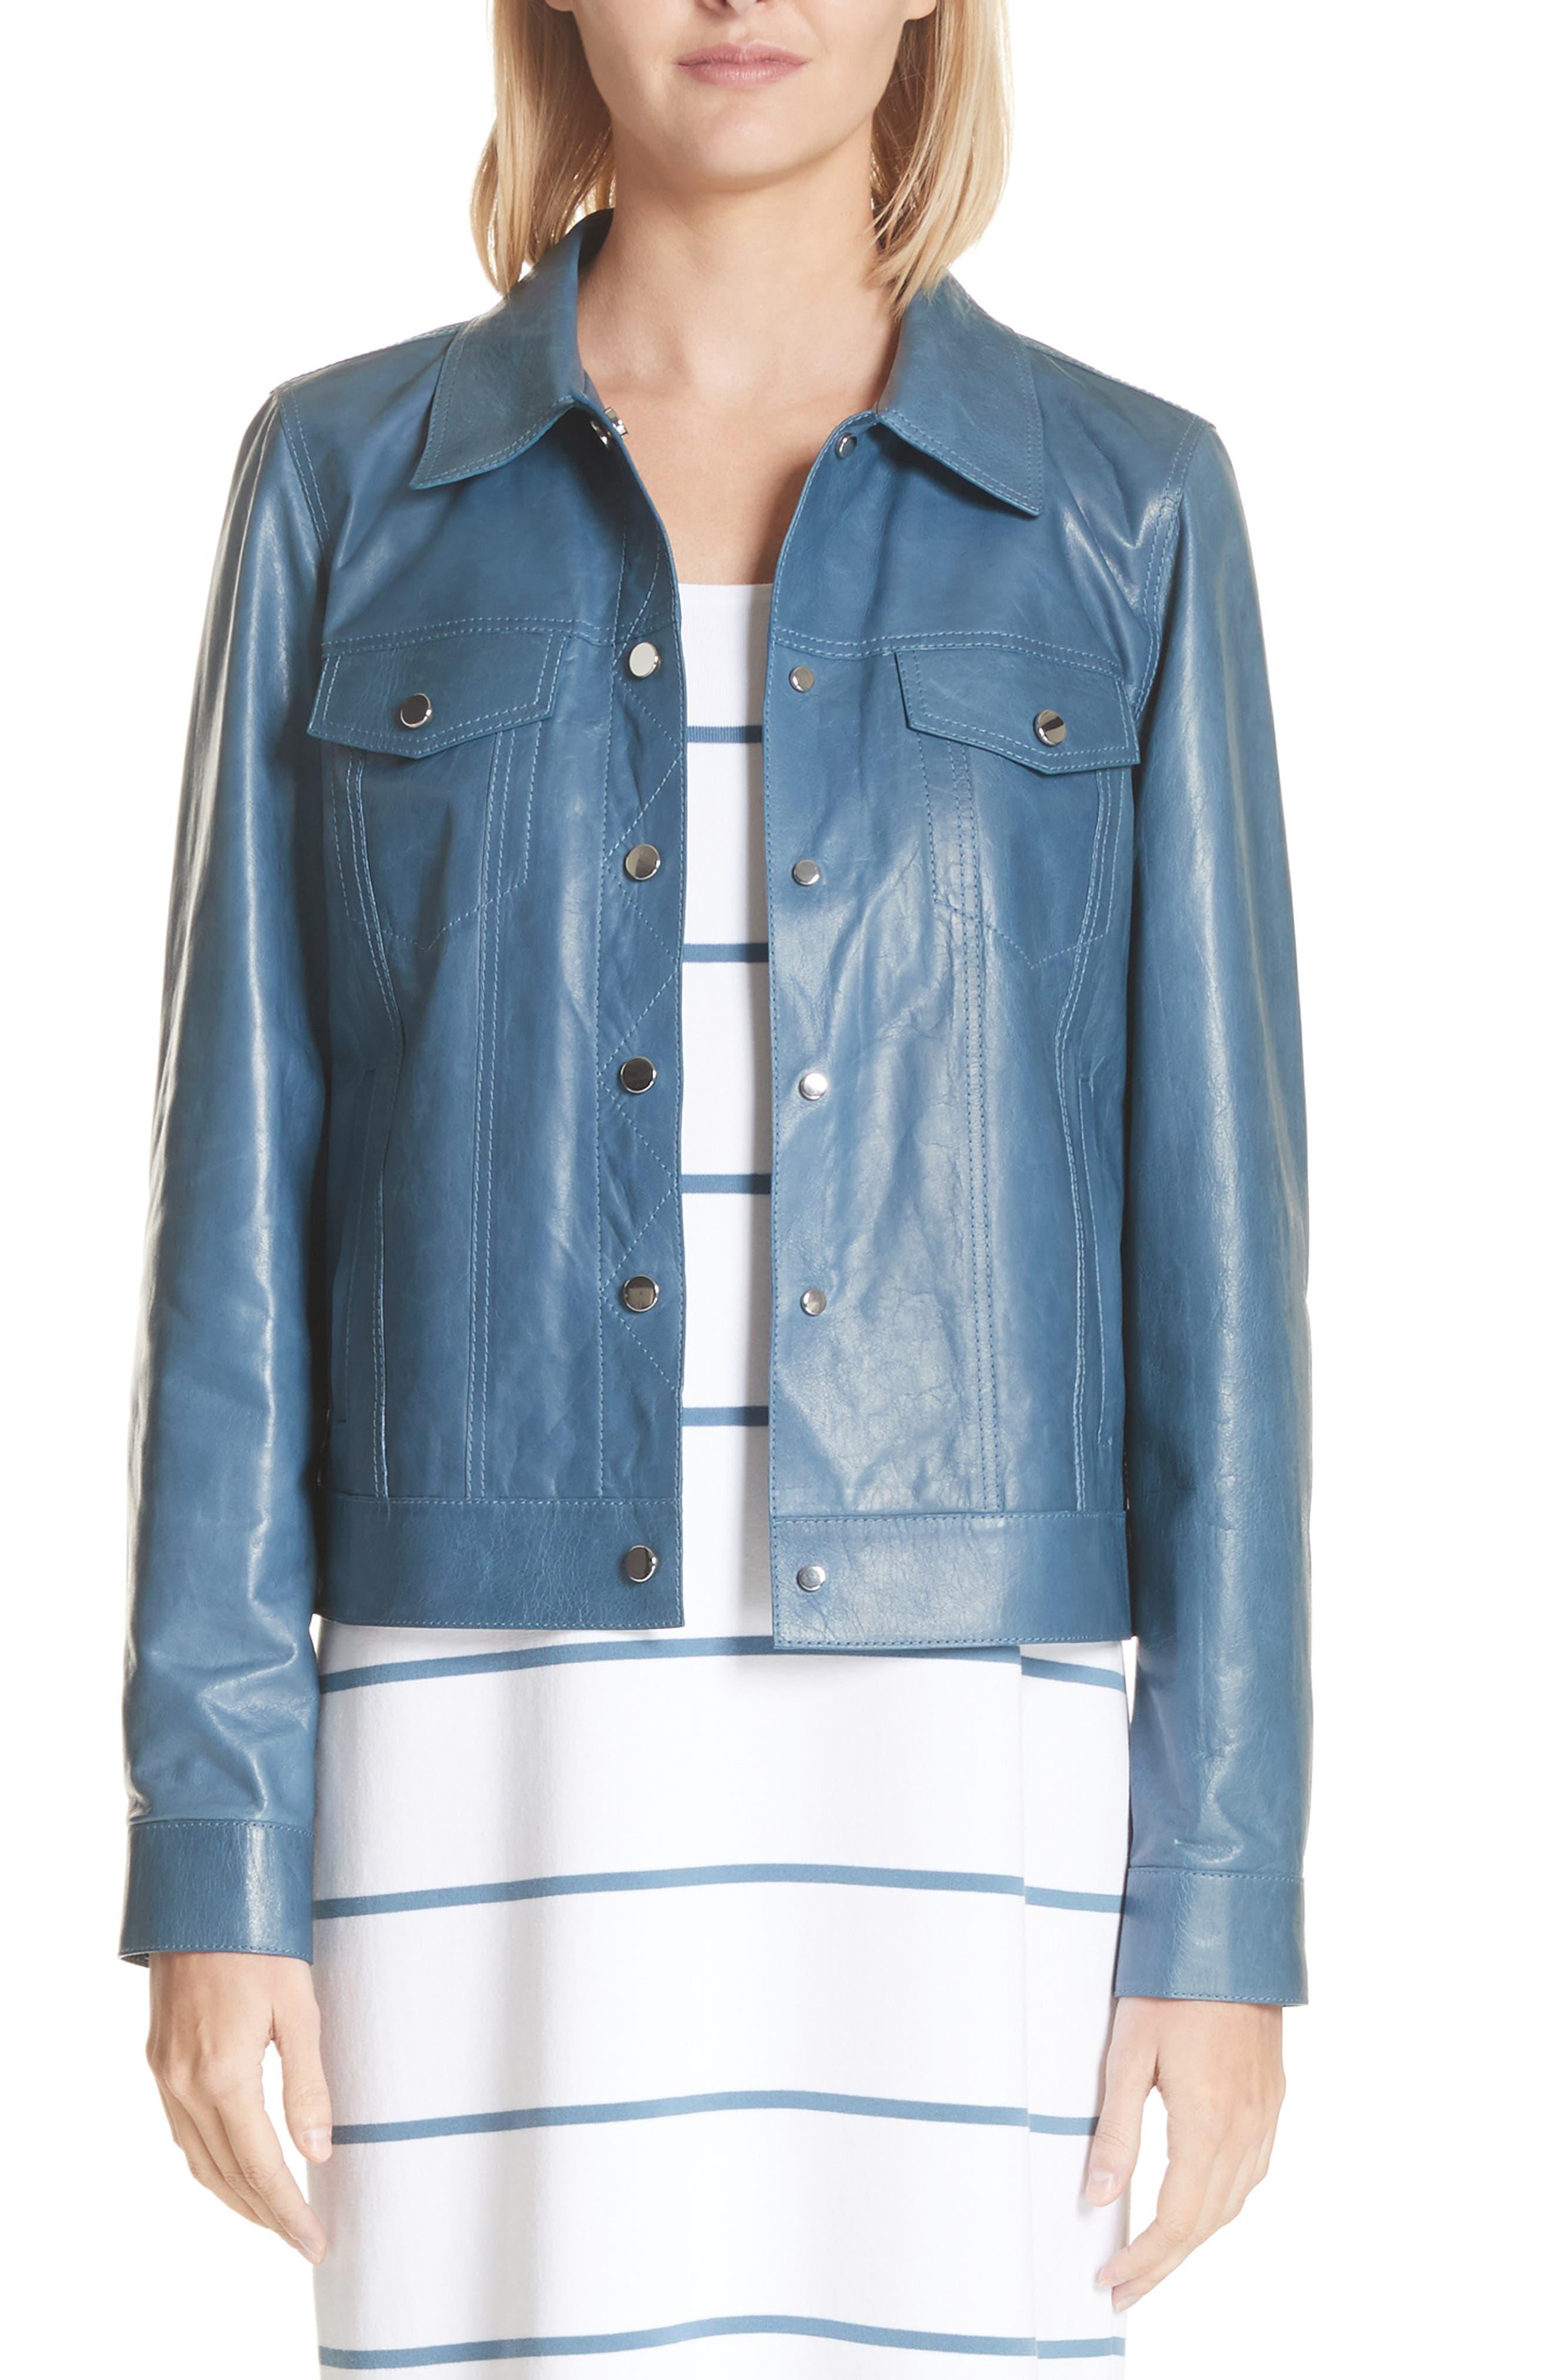 Destiny Leather Jacket,                             Main thumbnail 1, color,                             480